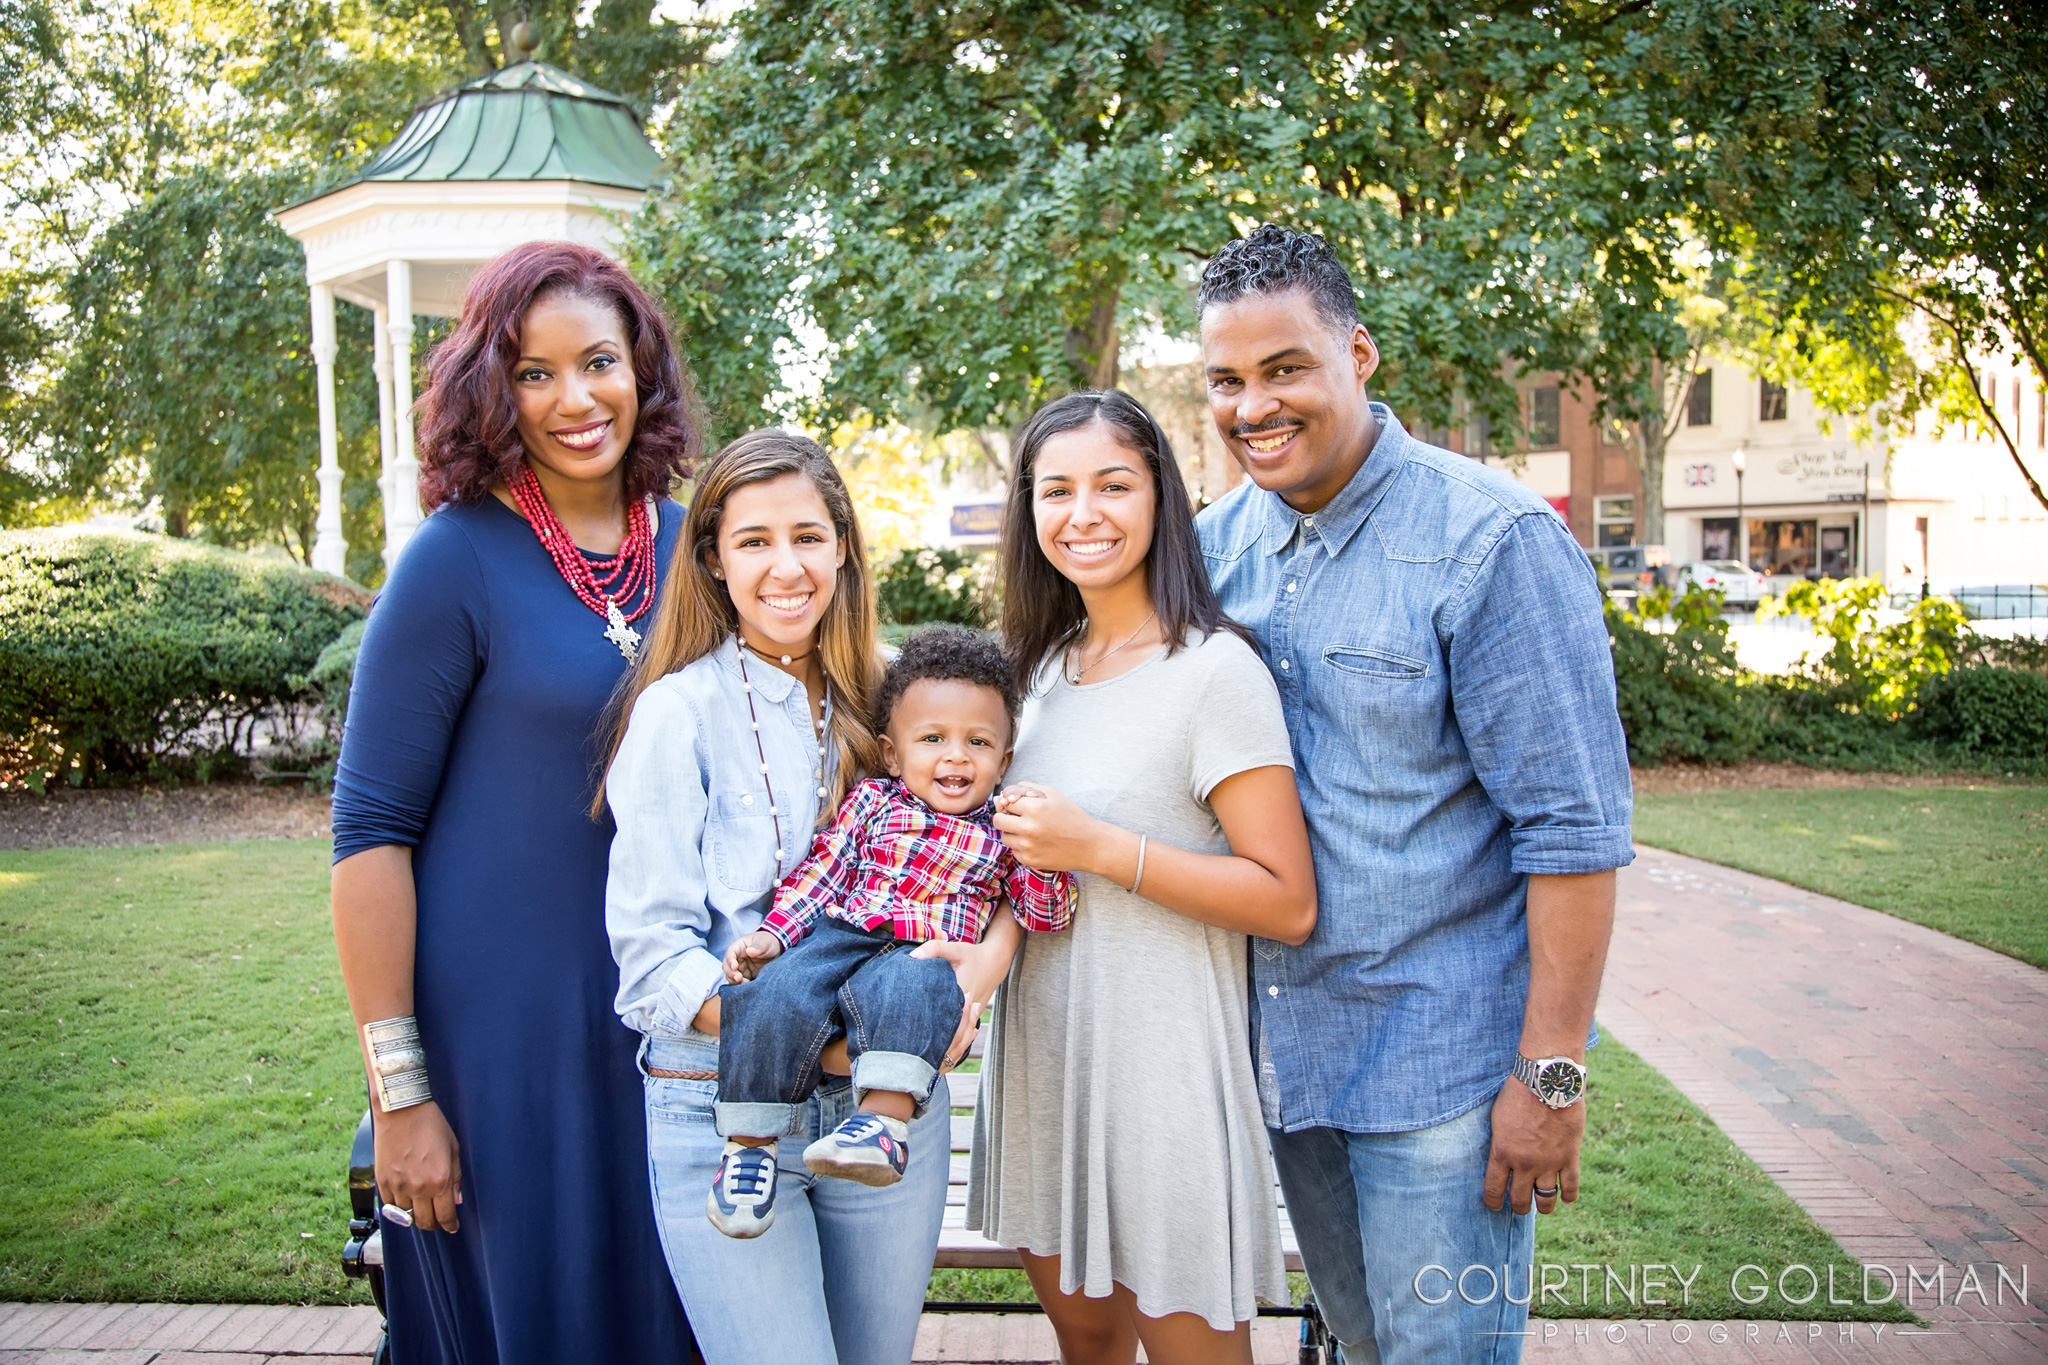 005-Atlanta-Family-Portrait-Photography-by-Coutney-Goldman.jpg